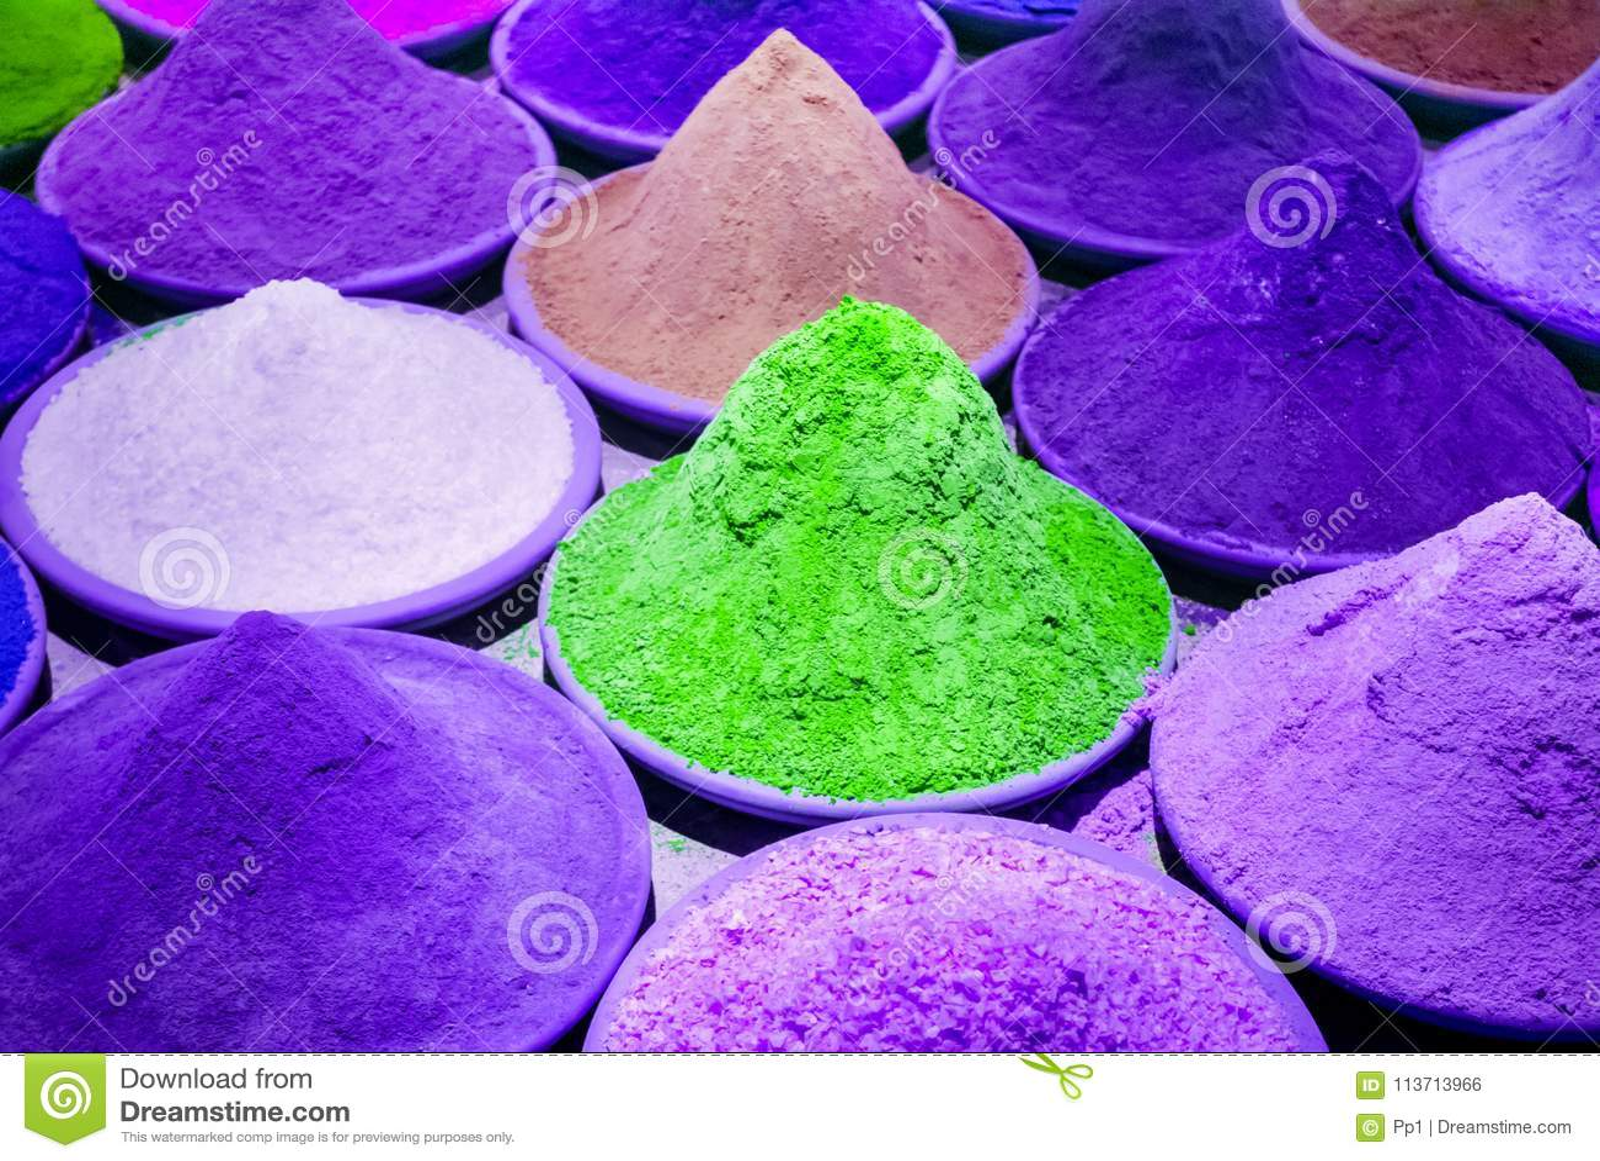 Color Coloring Dye Powder Piles In Indian Market Purple, Violet ...